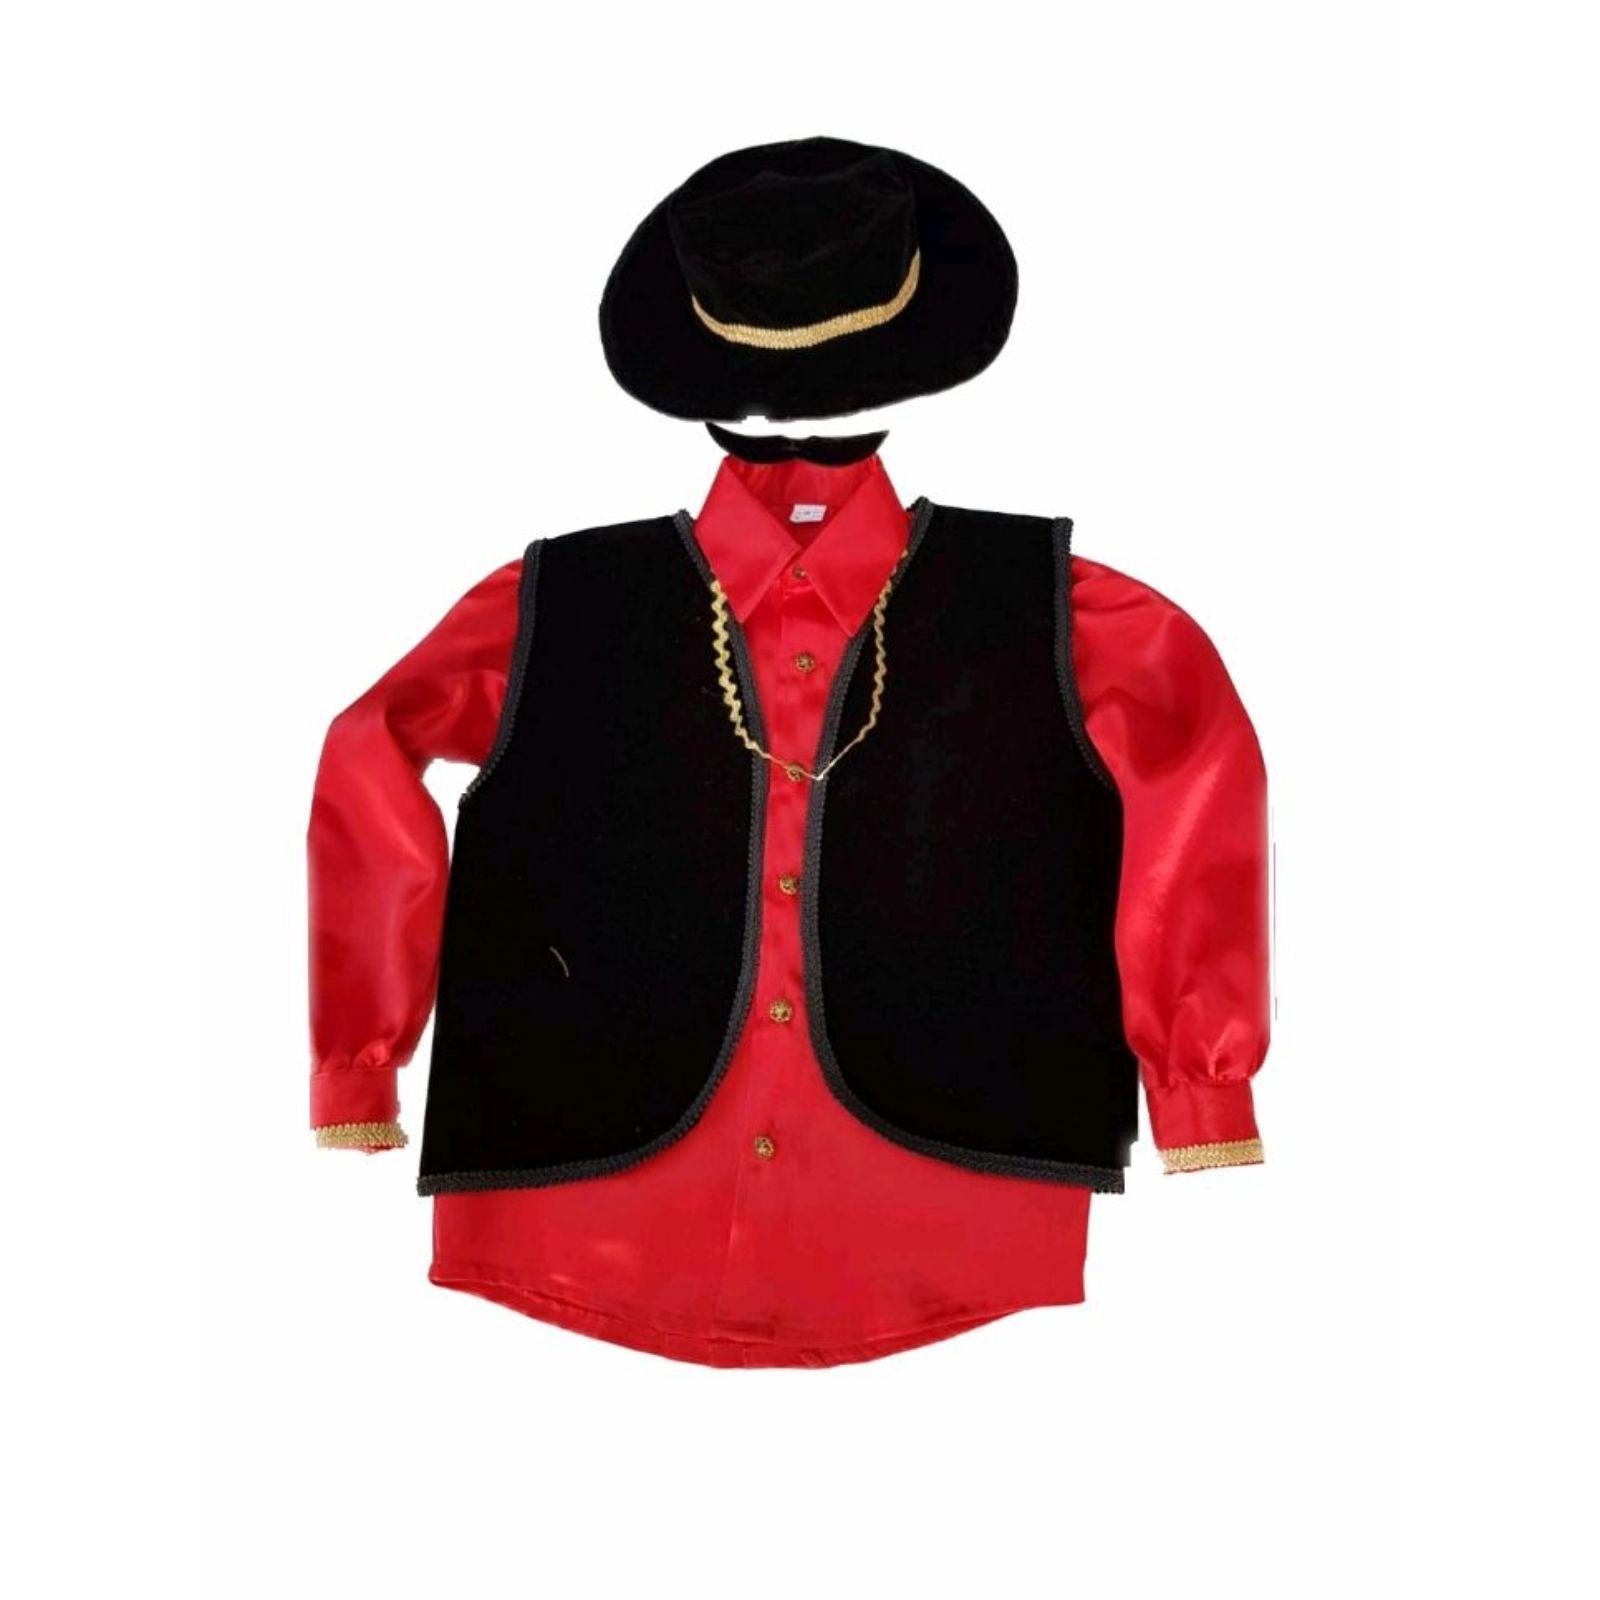 Costum țigan roșu cu vesta catifea